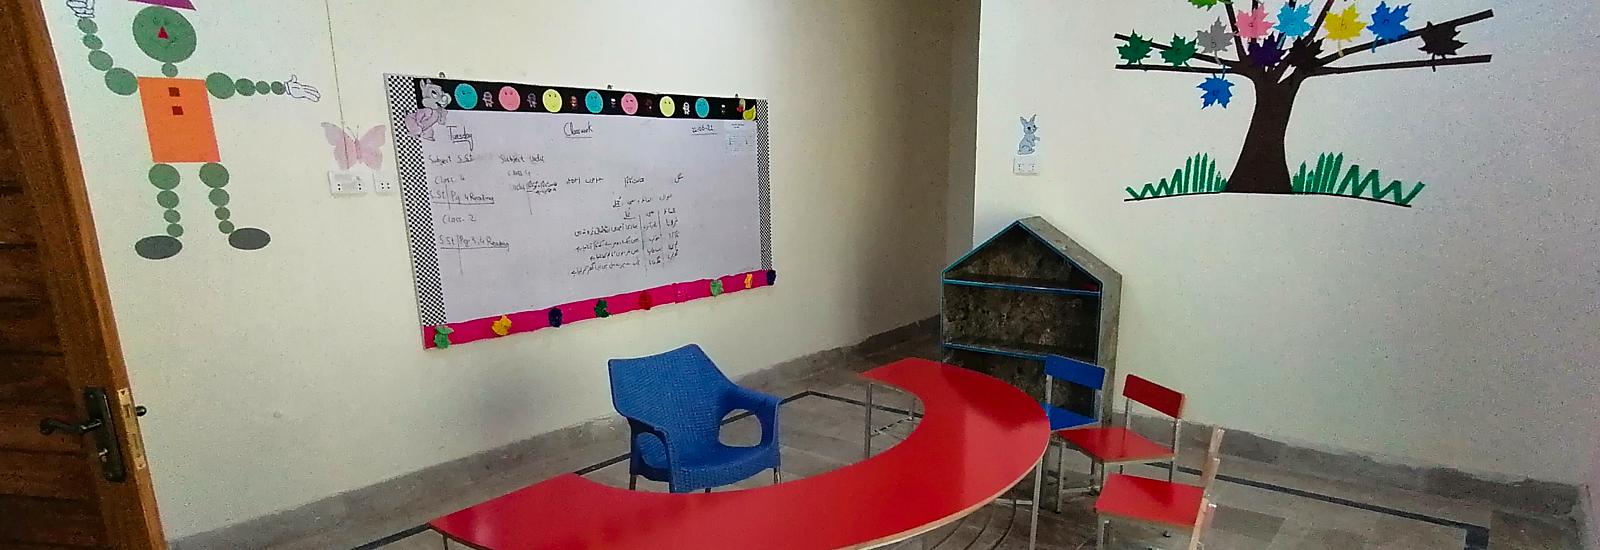 Layyah Classroom